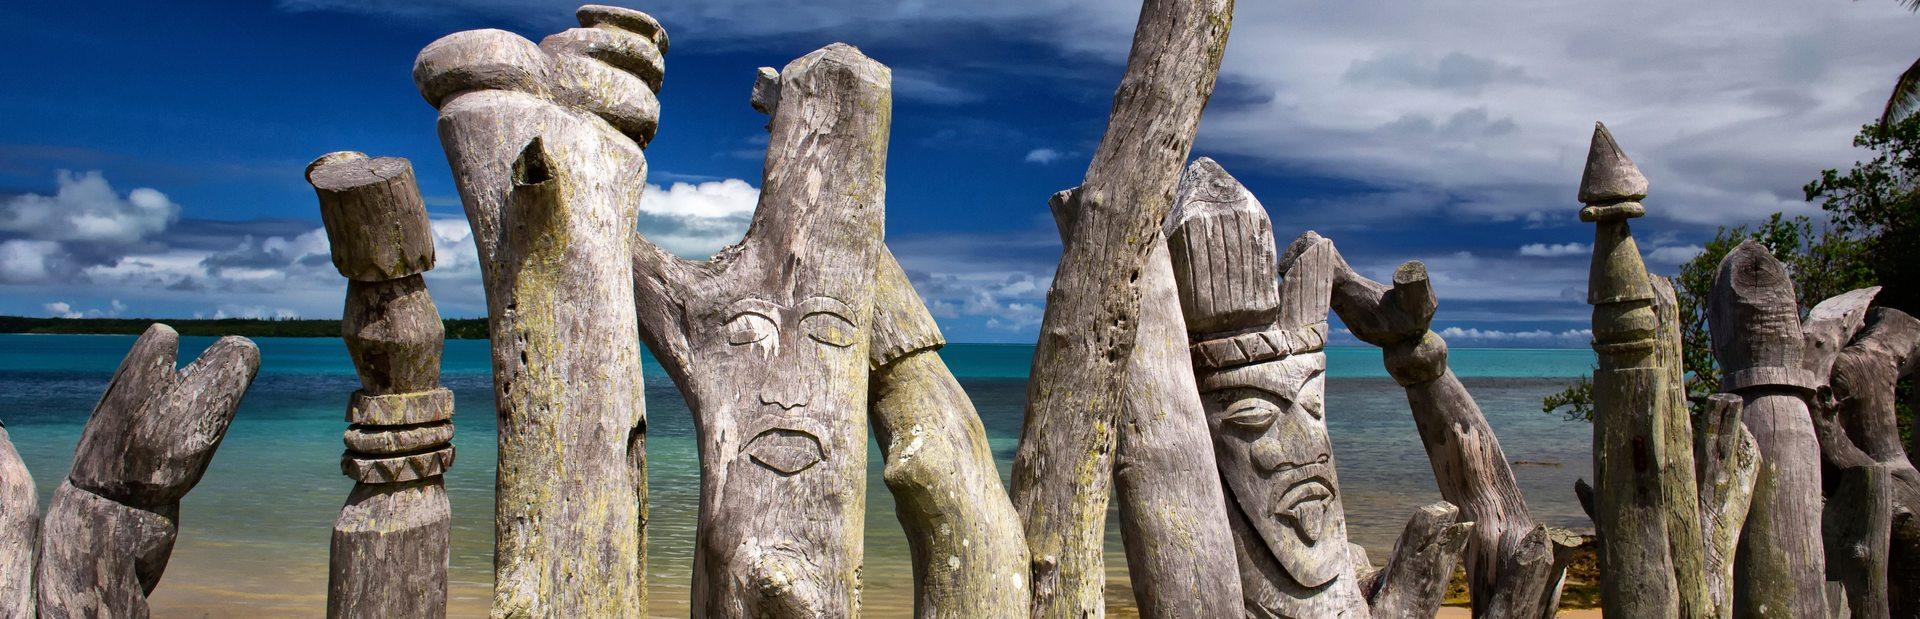 New Caledonia photo tour